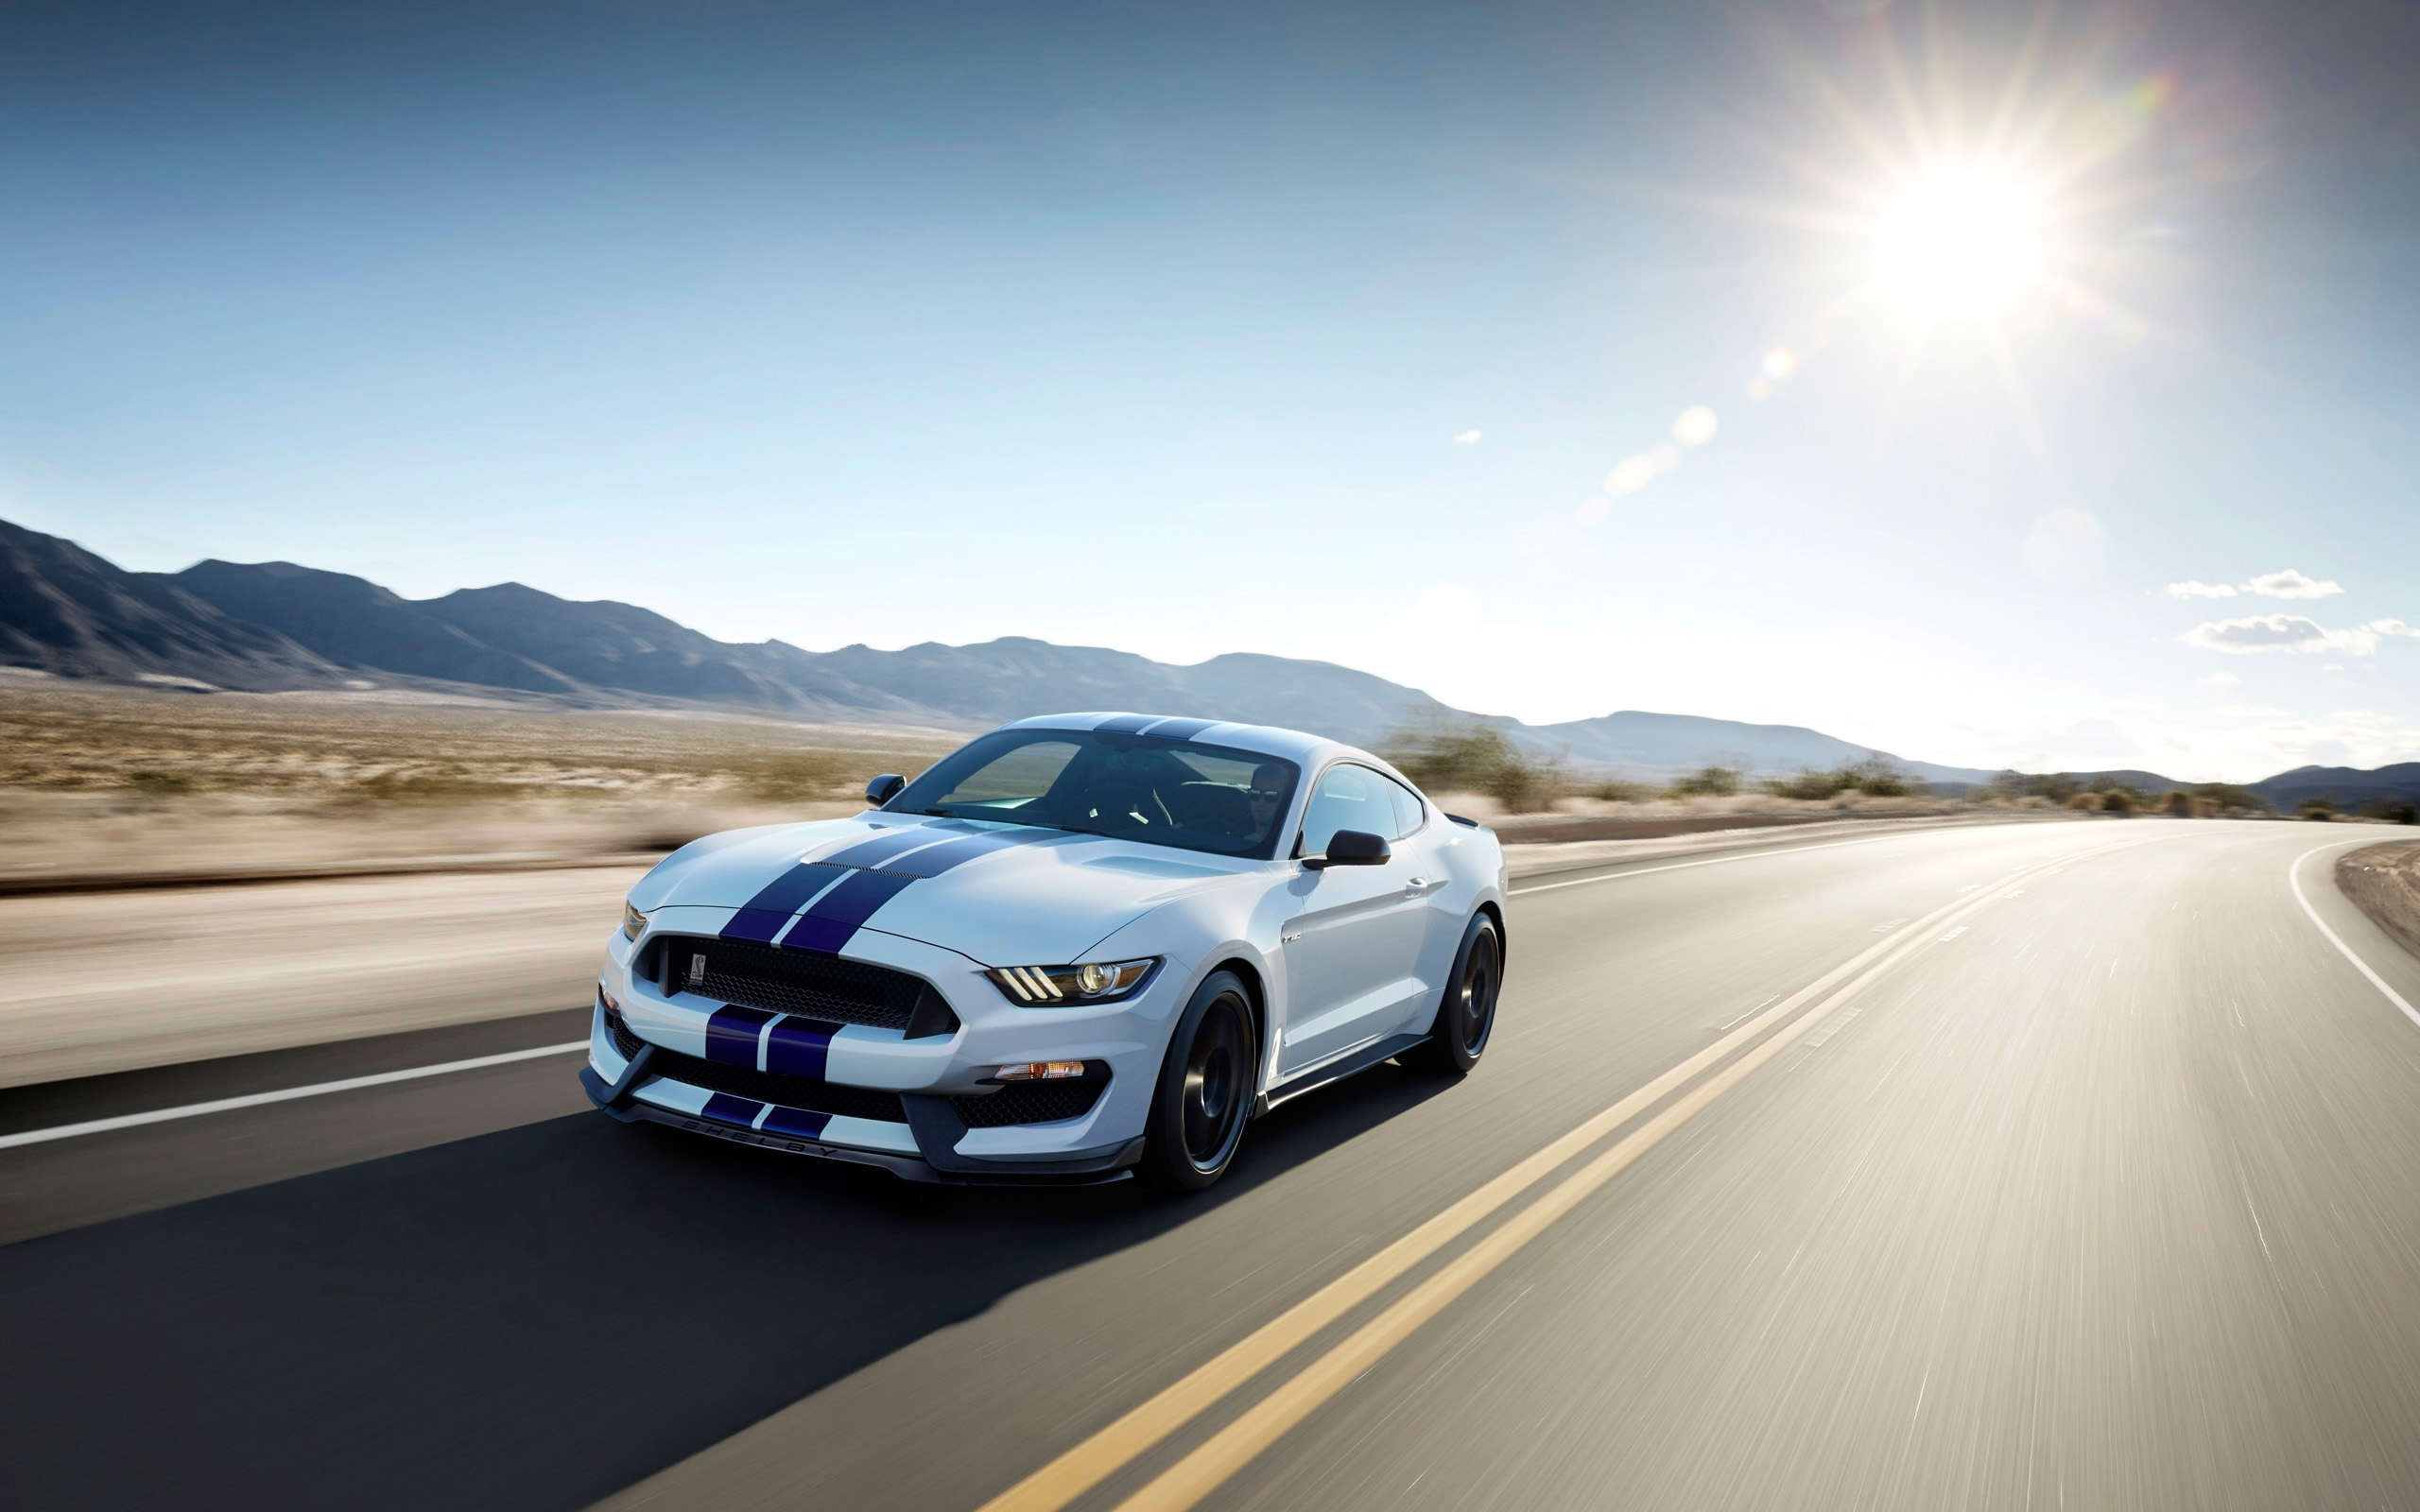 49 Ford Mustang Shelby 2015 Wallpaper On Wallpapersafari